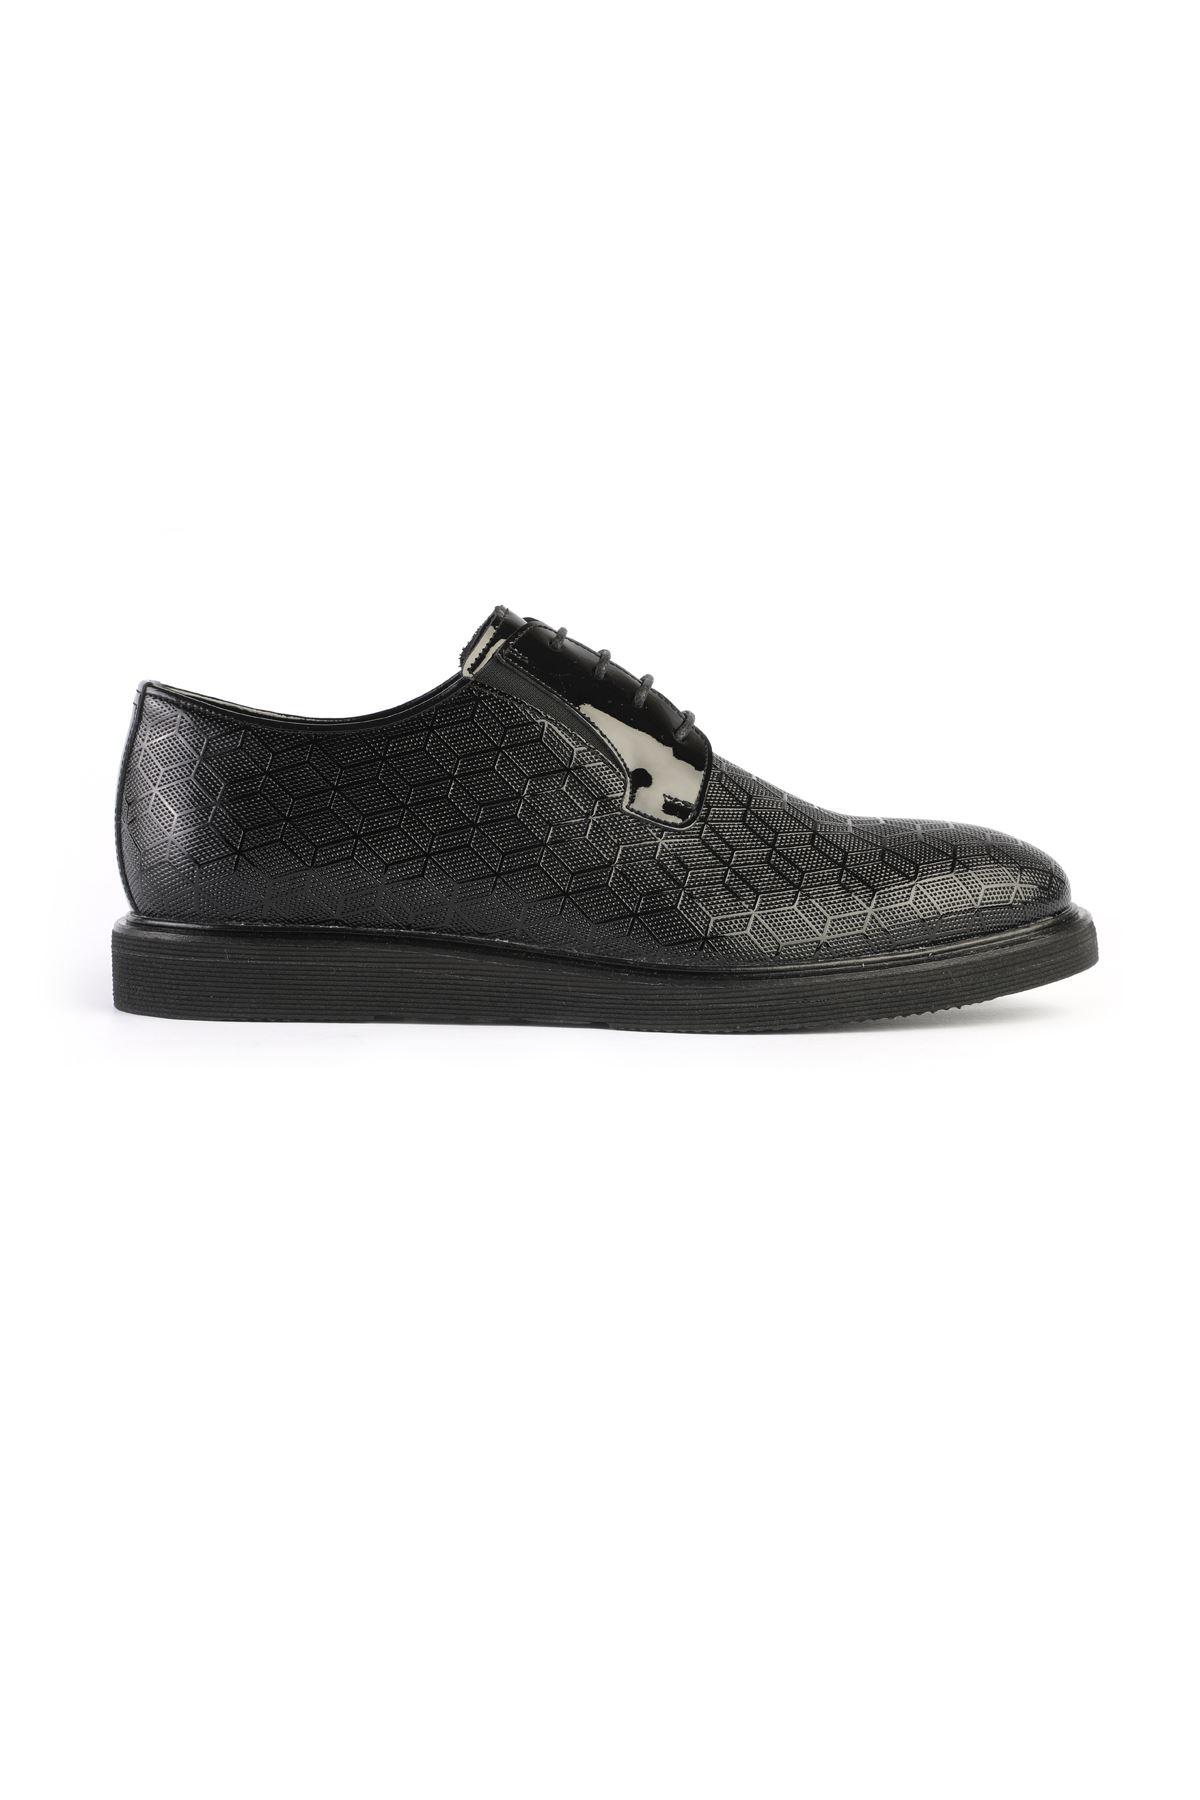 Libero 3234 Black Oxford Shoes